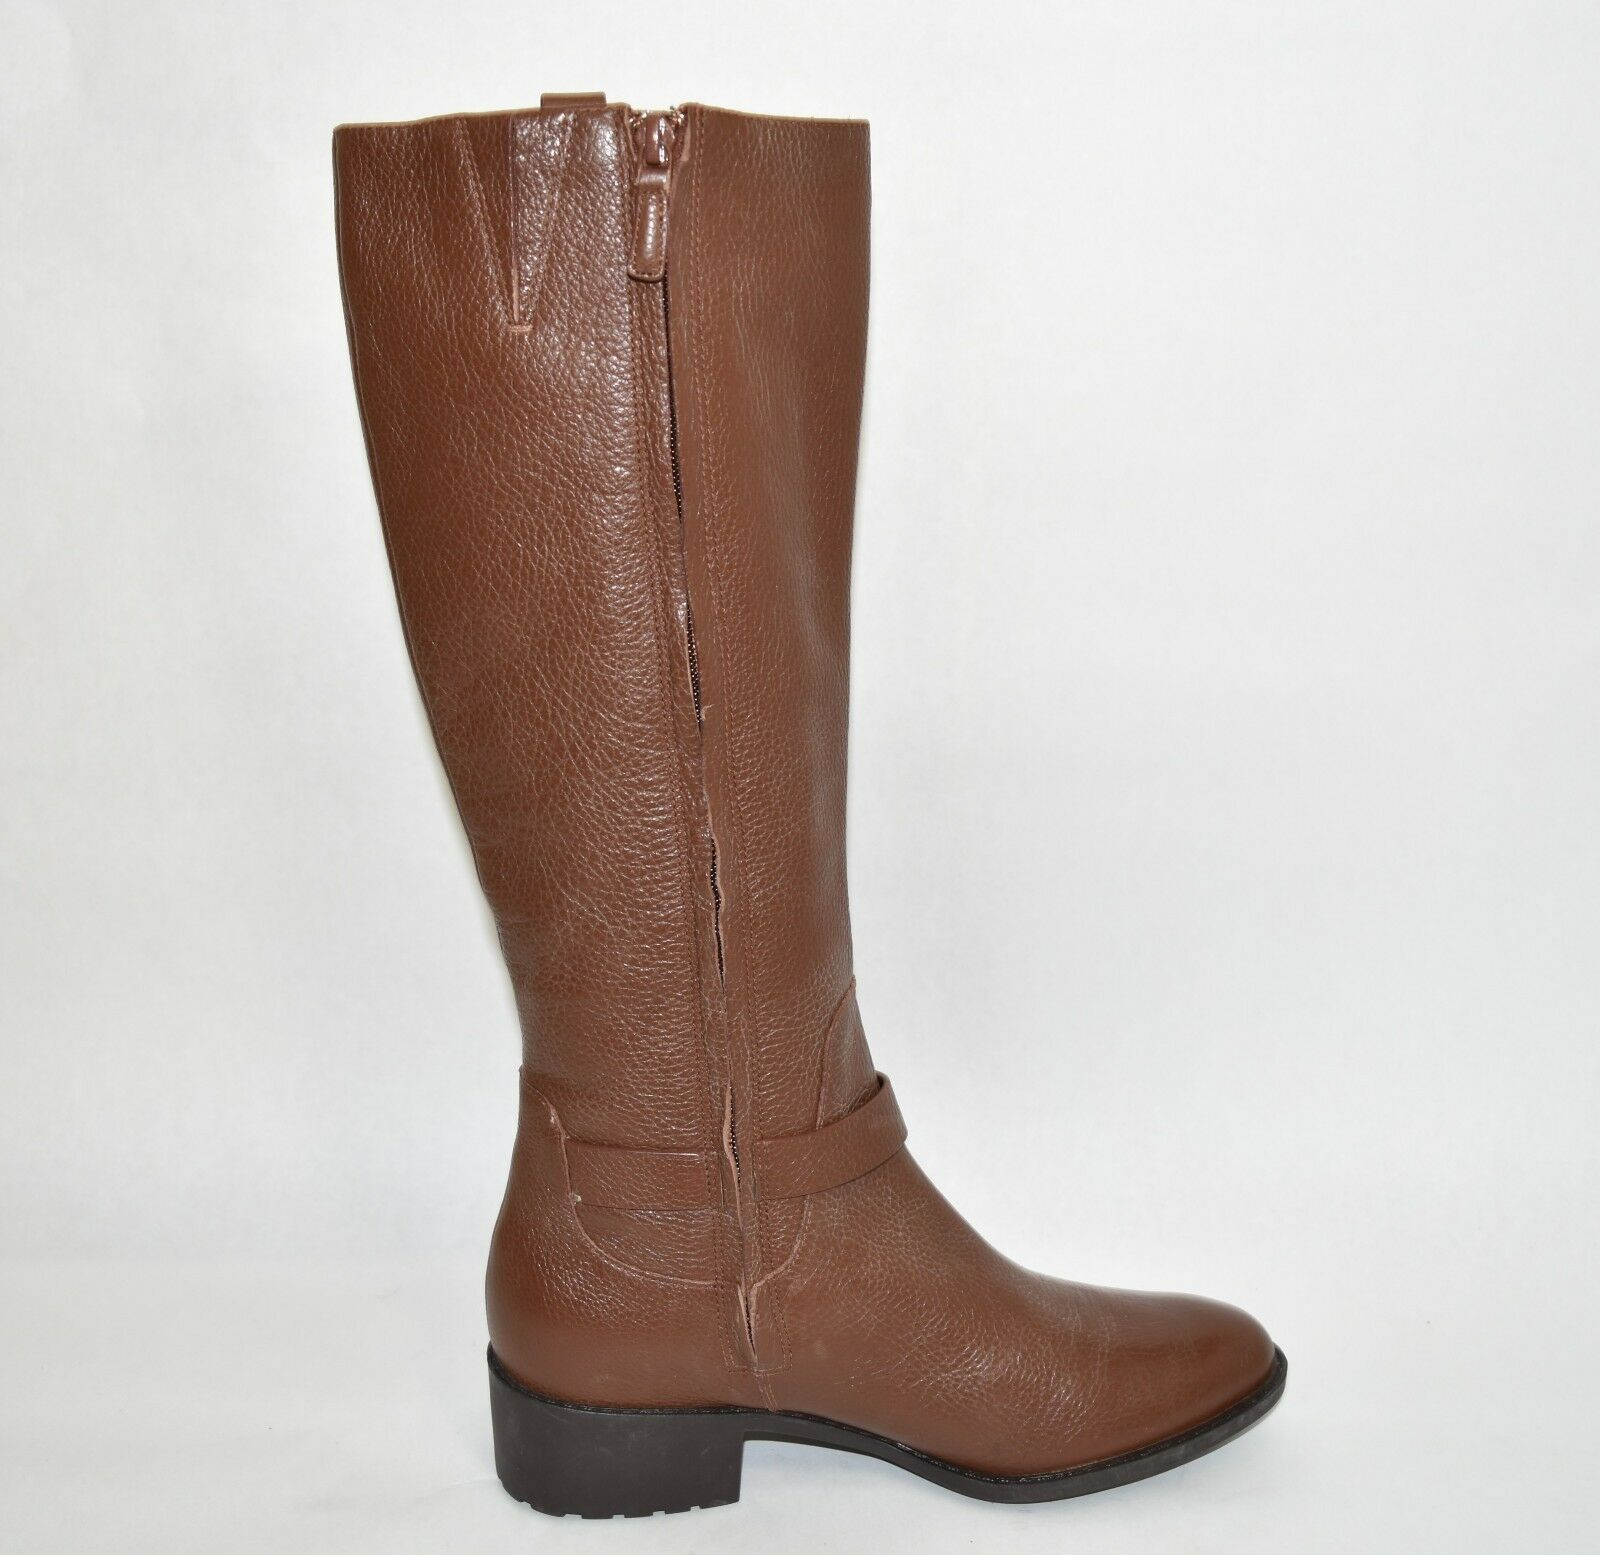 New  Cole Haan Haan Haan 'Kenmare' Harvest Brown Leather Boot Size 8.5 B  MRSP  400   T7 f4b942